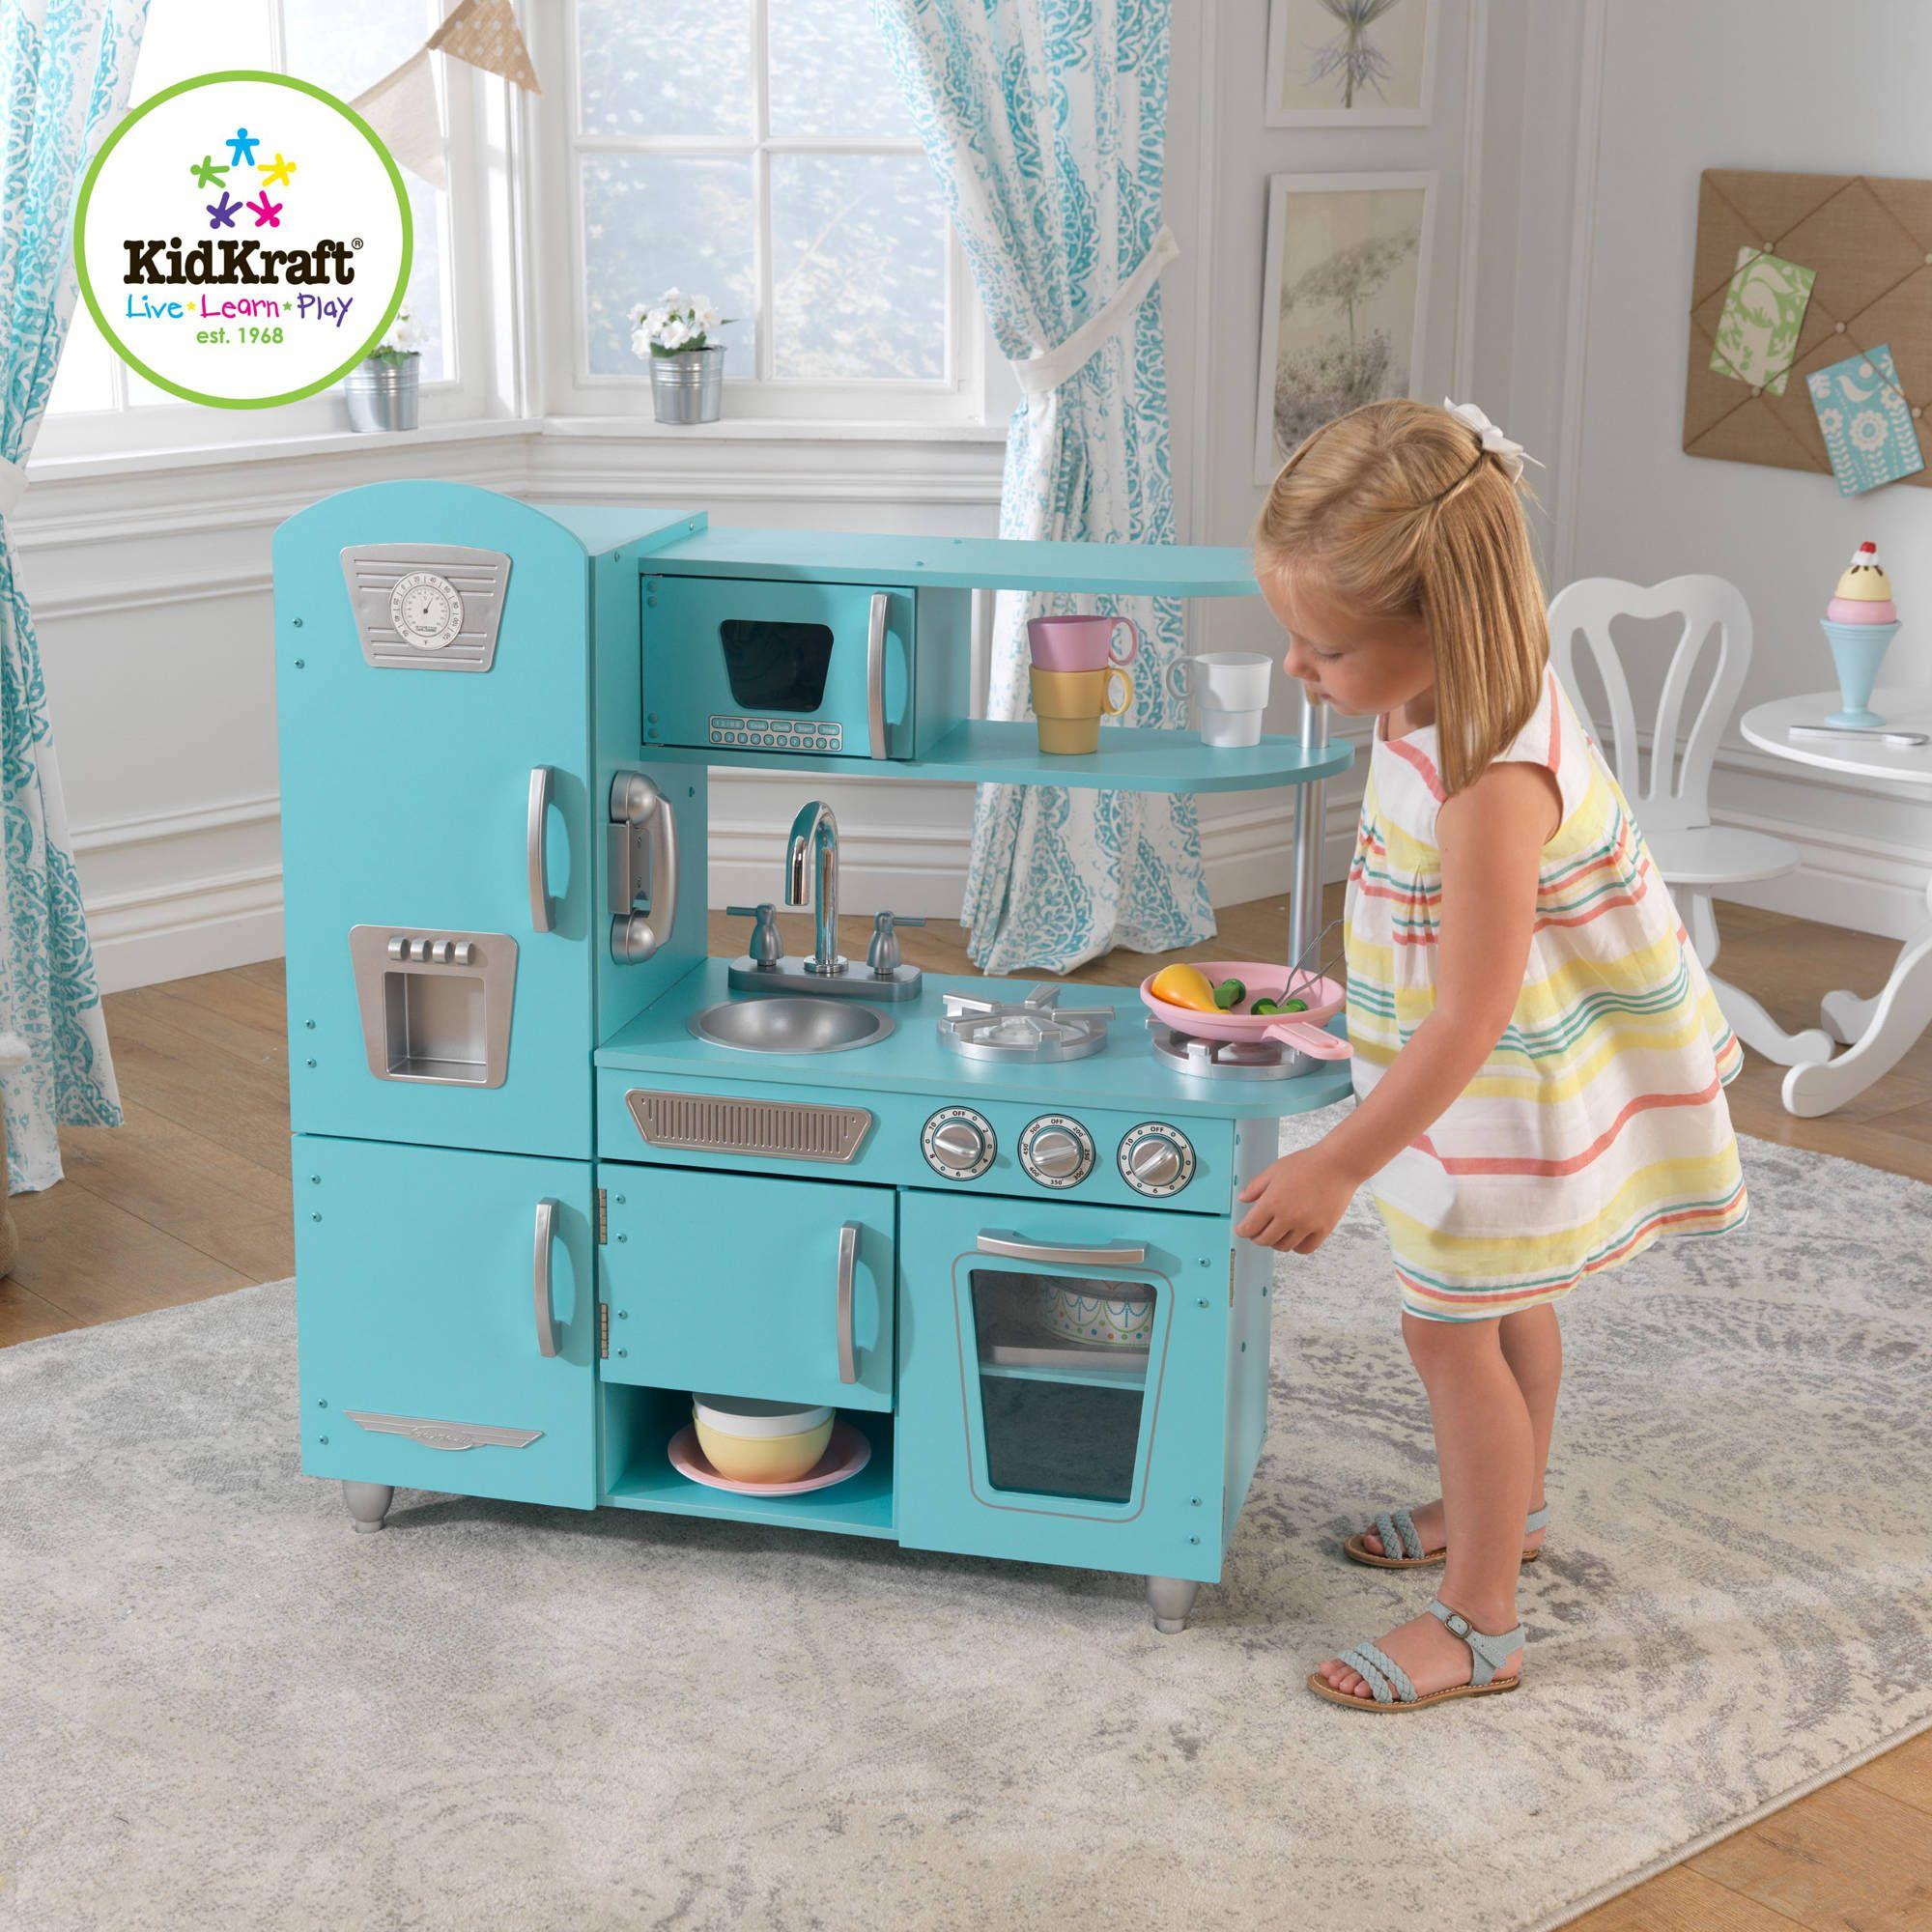 Kidkraft Vintage Wooden Play Kitchen Set Blue My Little Pepper Pinterest Sets And Painting Prints